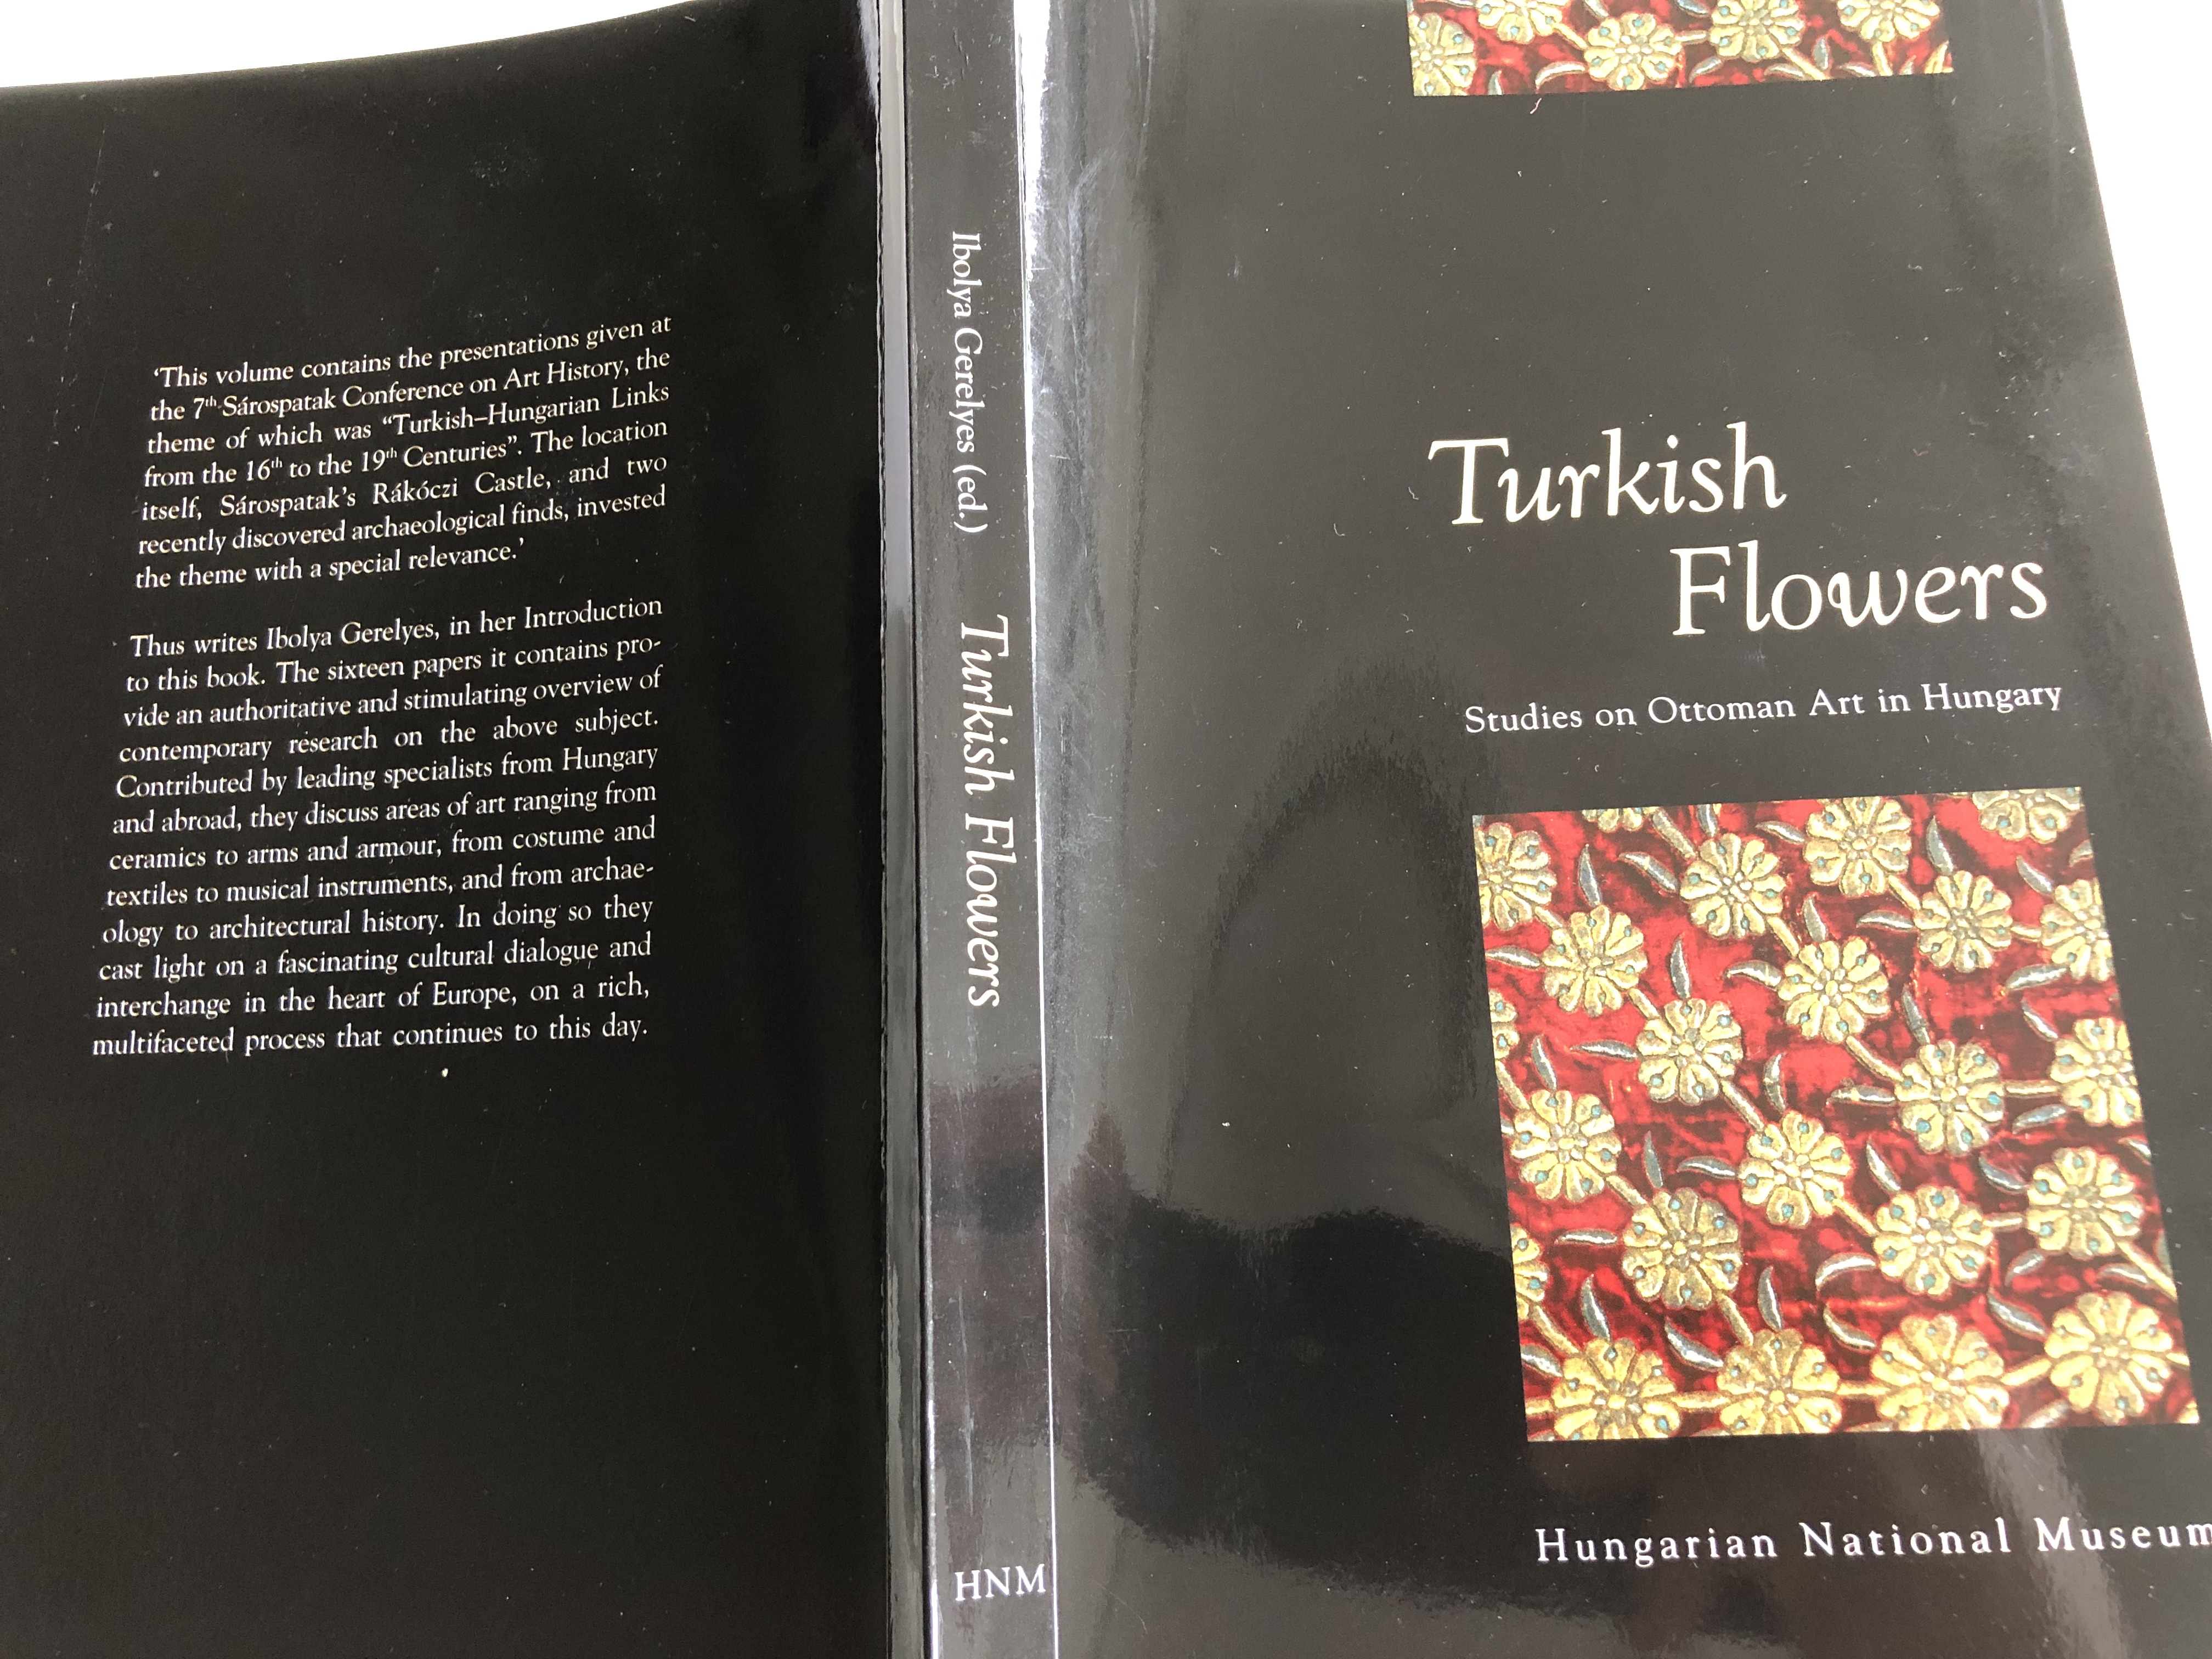 turkish-flowers-studies-on-ottoman-art-in-hungary-hungarian-national-museum-2005-editor-ibolya-gerelyes-21-.jpg